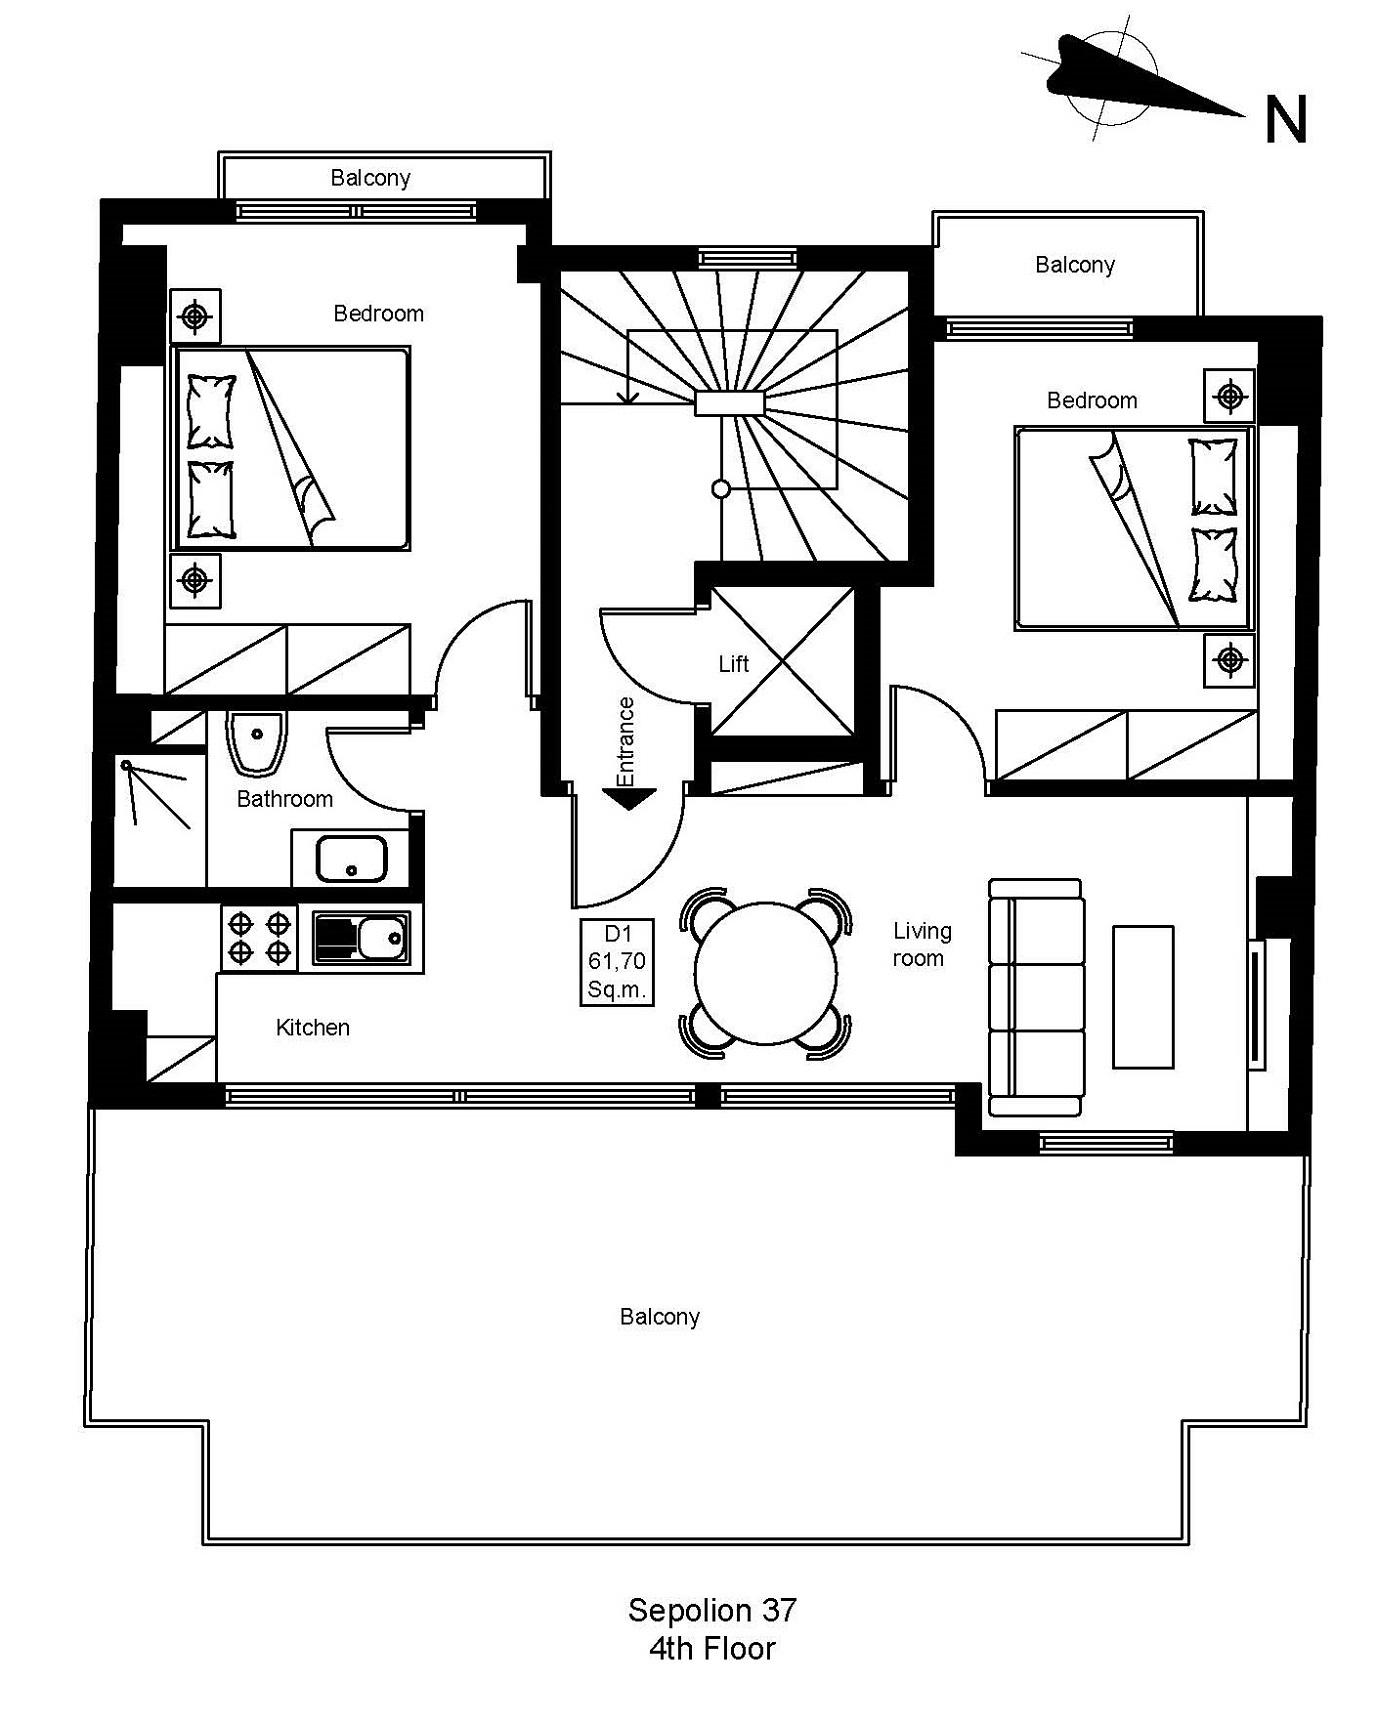 Sepolion 37 4th floor plan